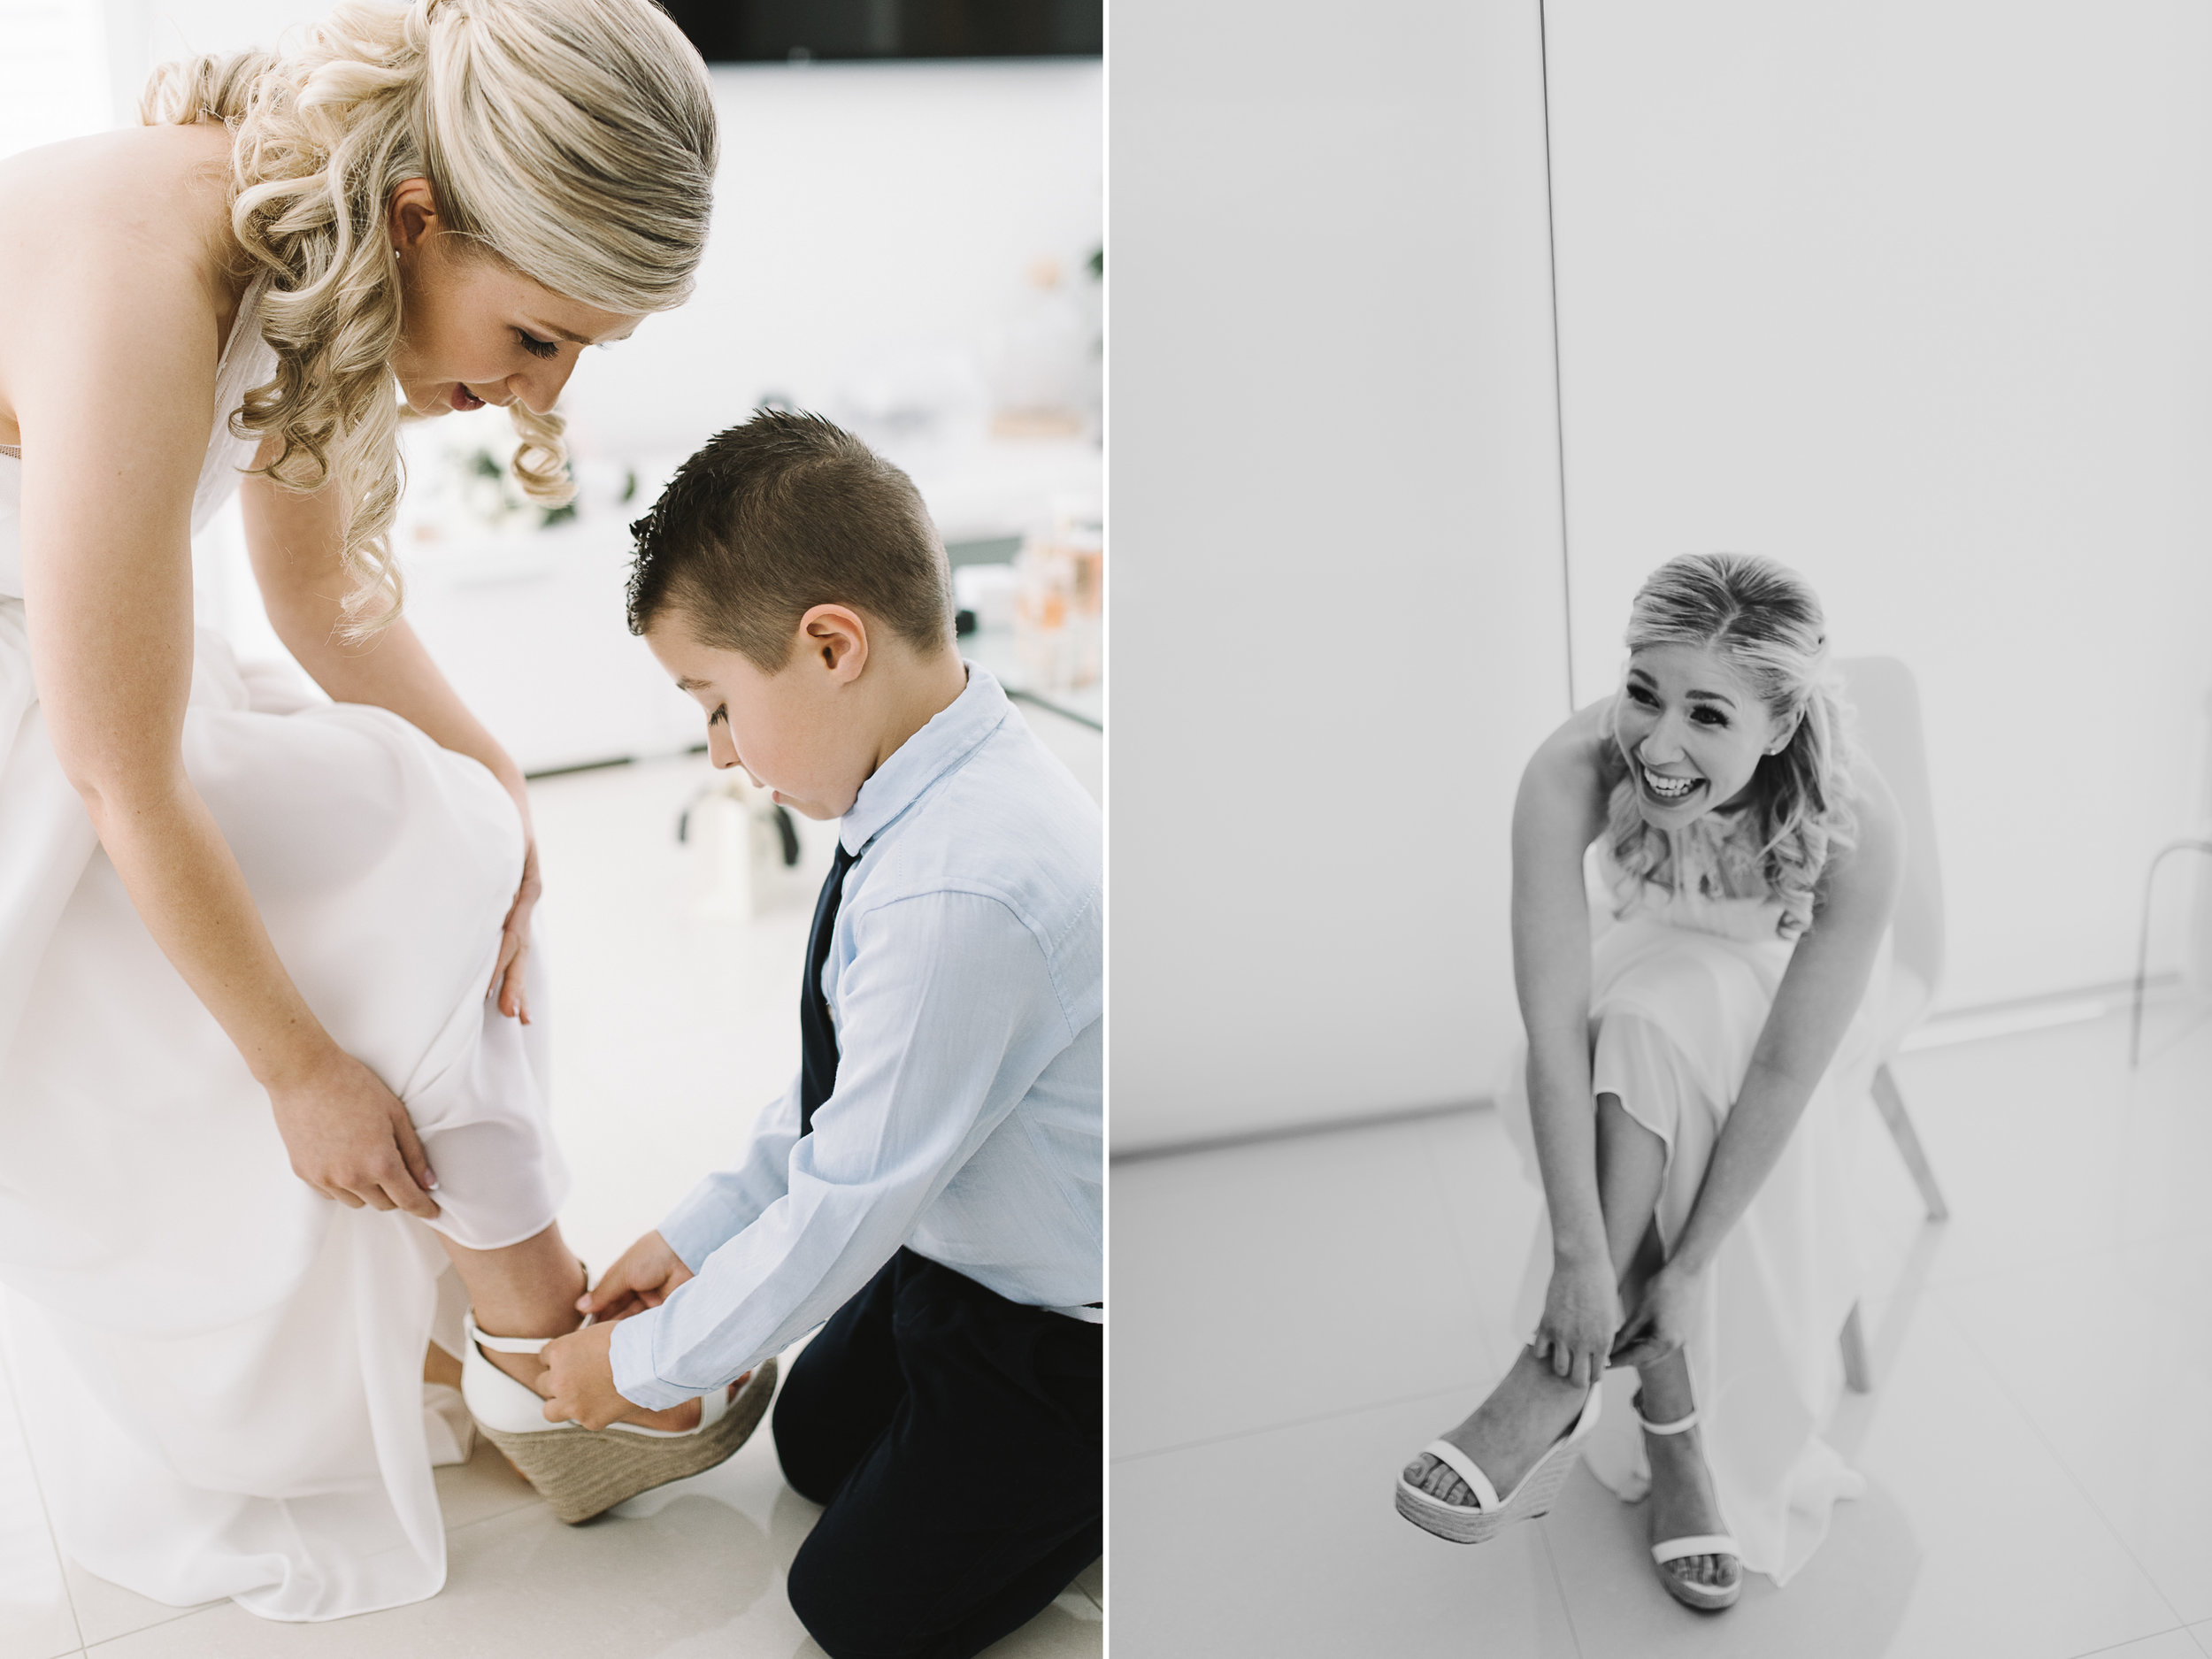 sydney-wedding-photography-shoes-1.jpg